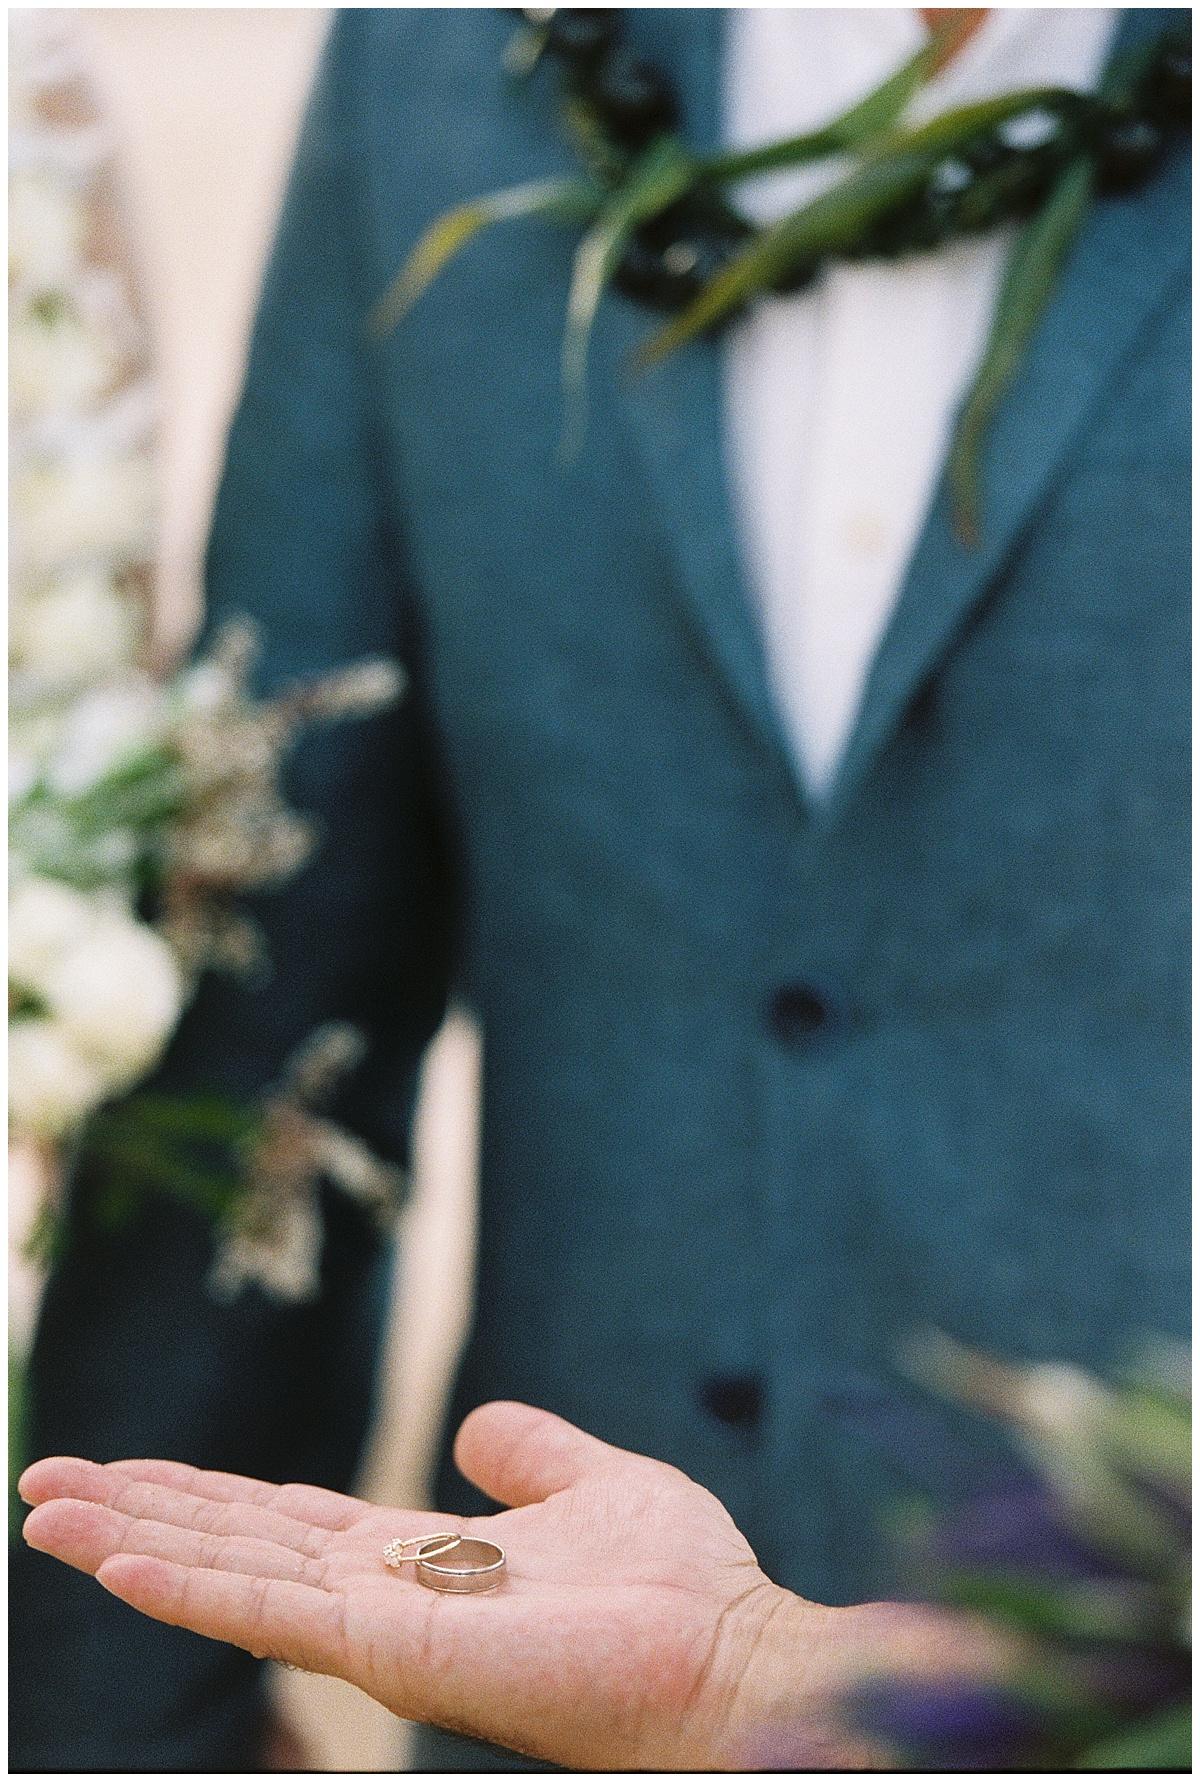 beach-elopement-ceremony-rings-blue-suit.jpg